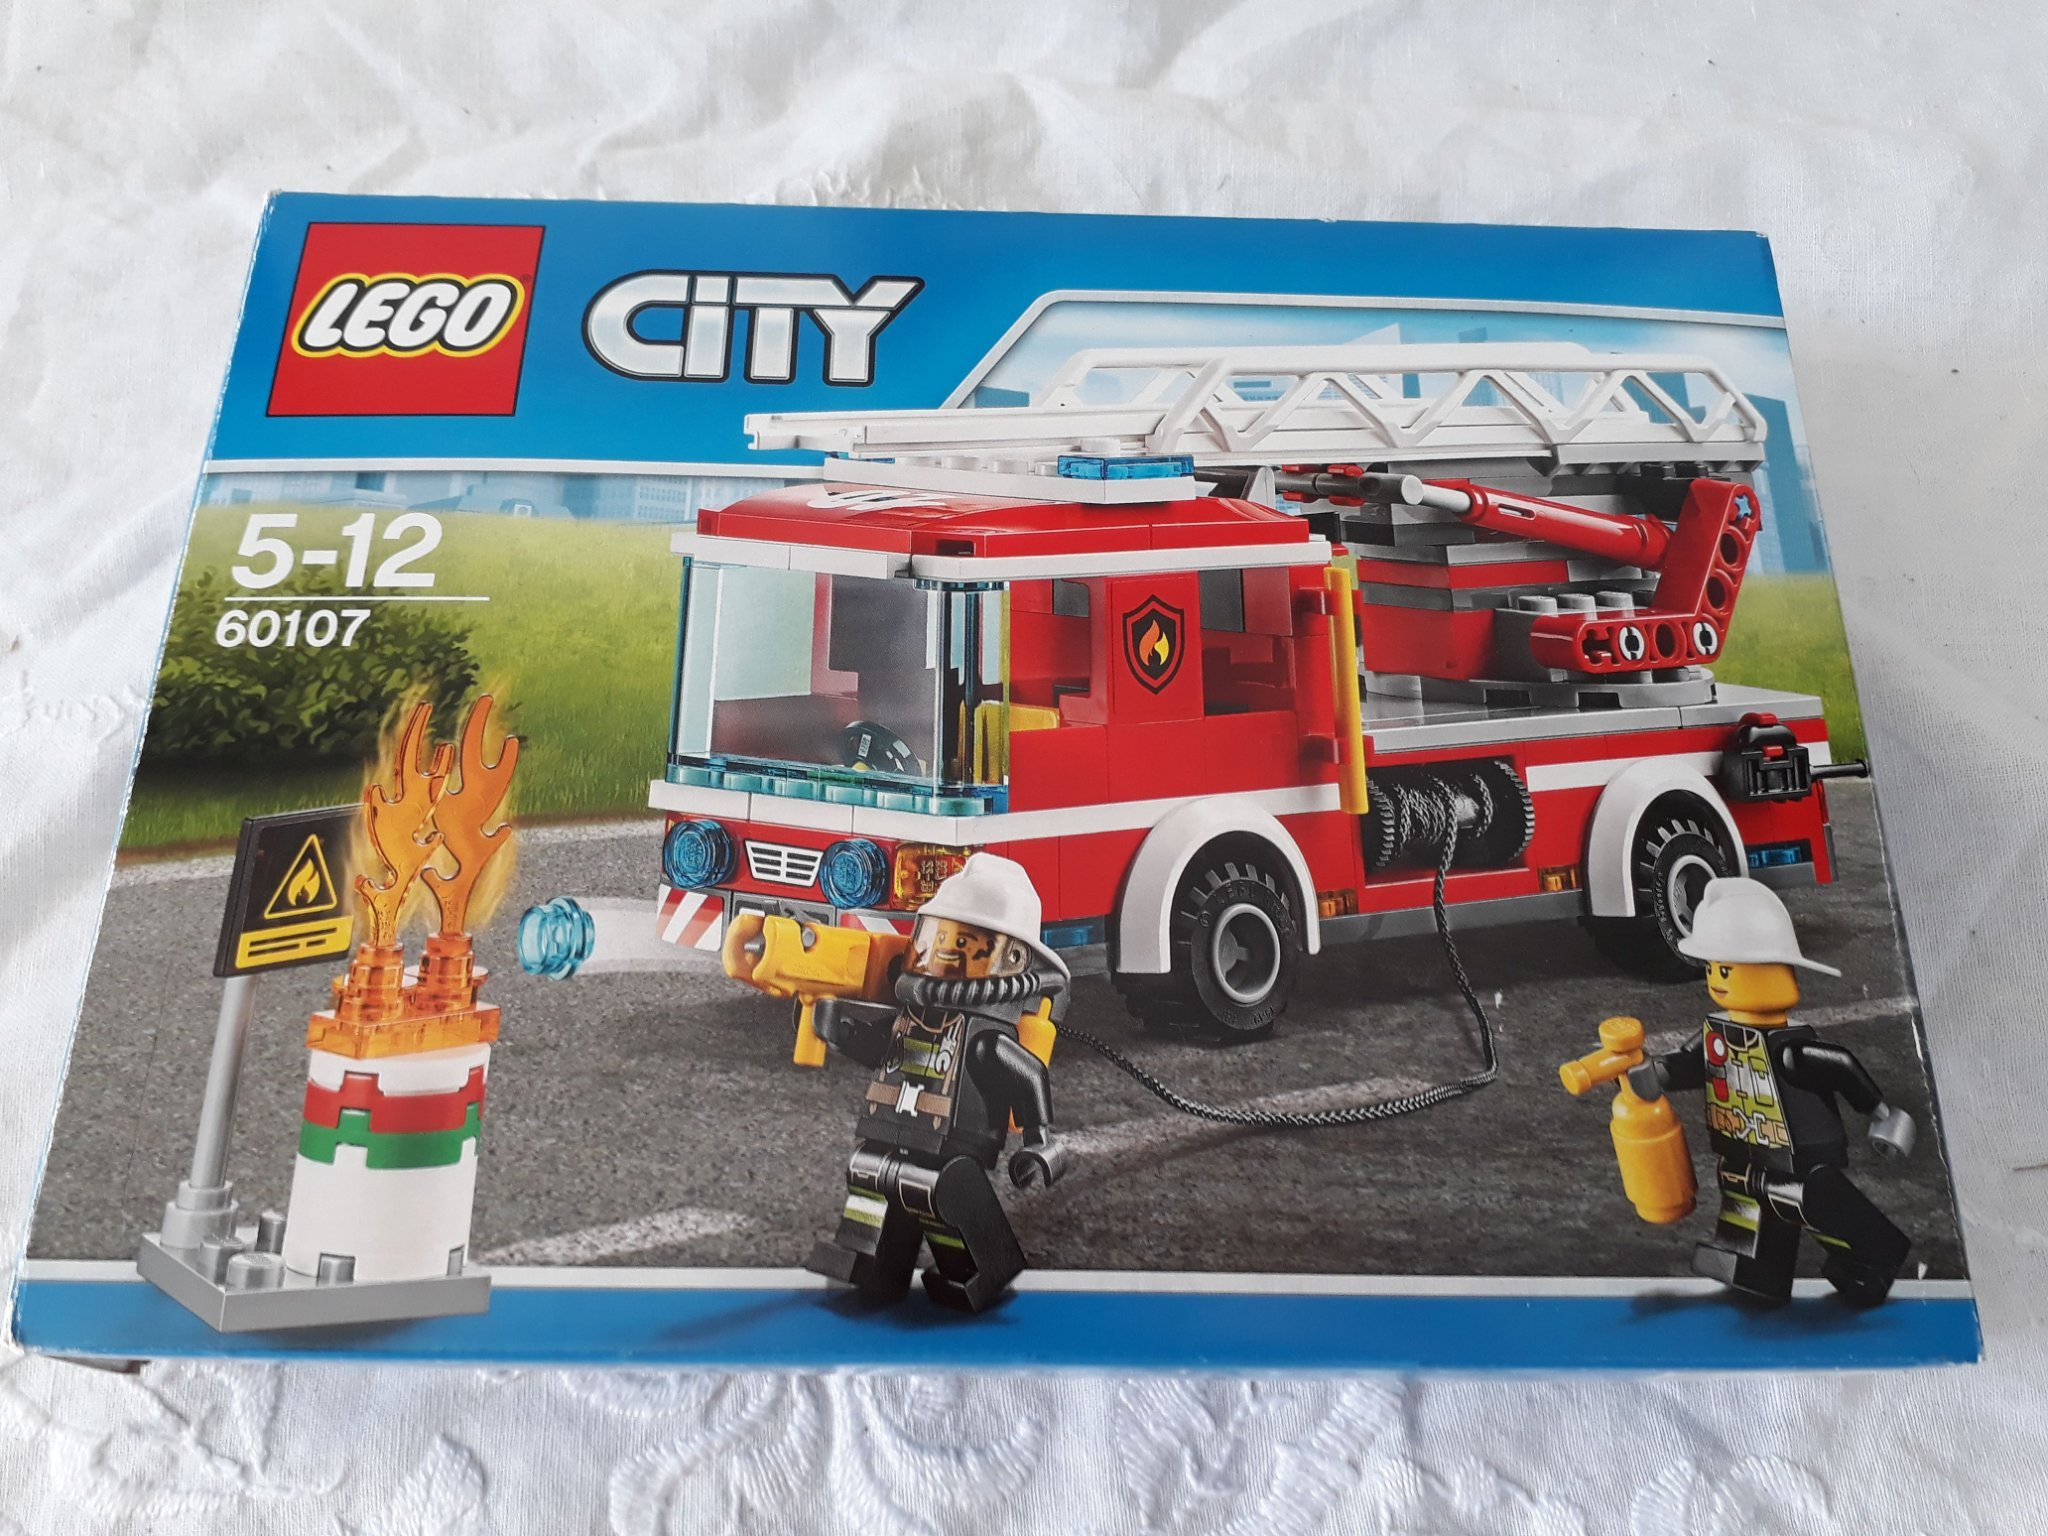 Ultramoderne Lego city 60107 brandbil originalkartong bruksa.. (347616808) ᐈ WI-25